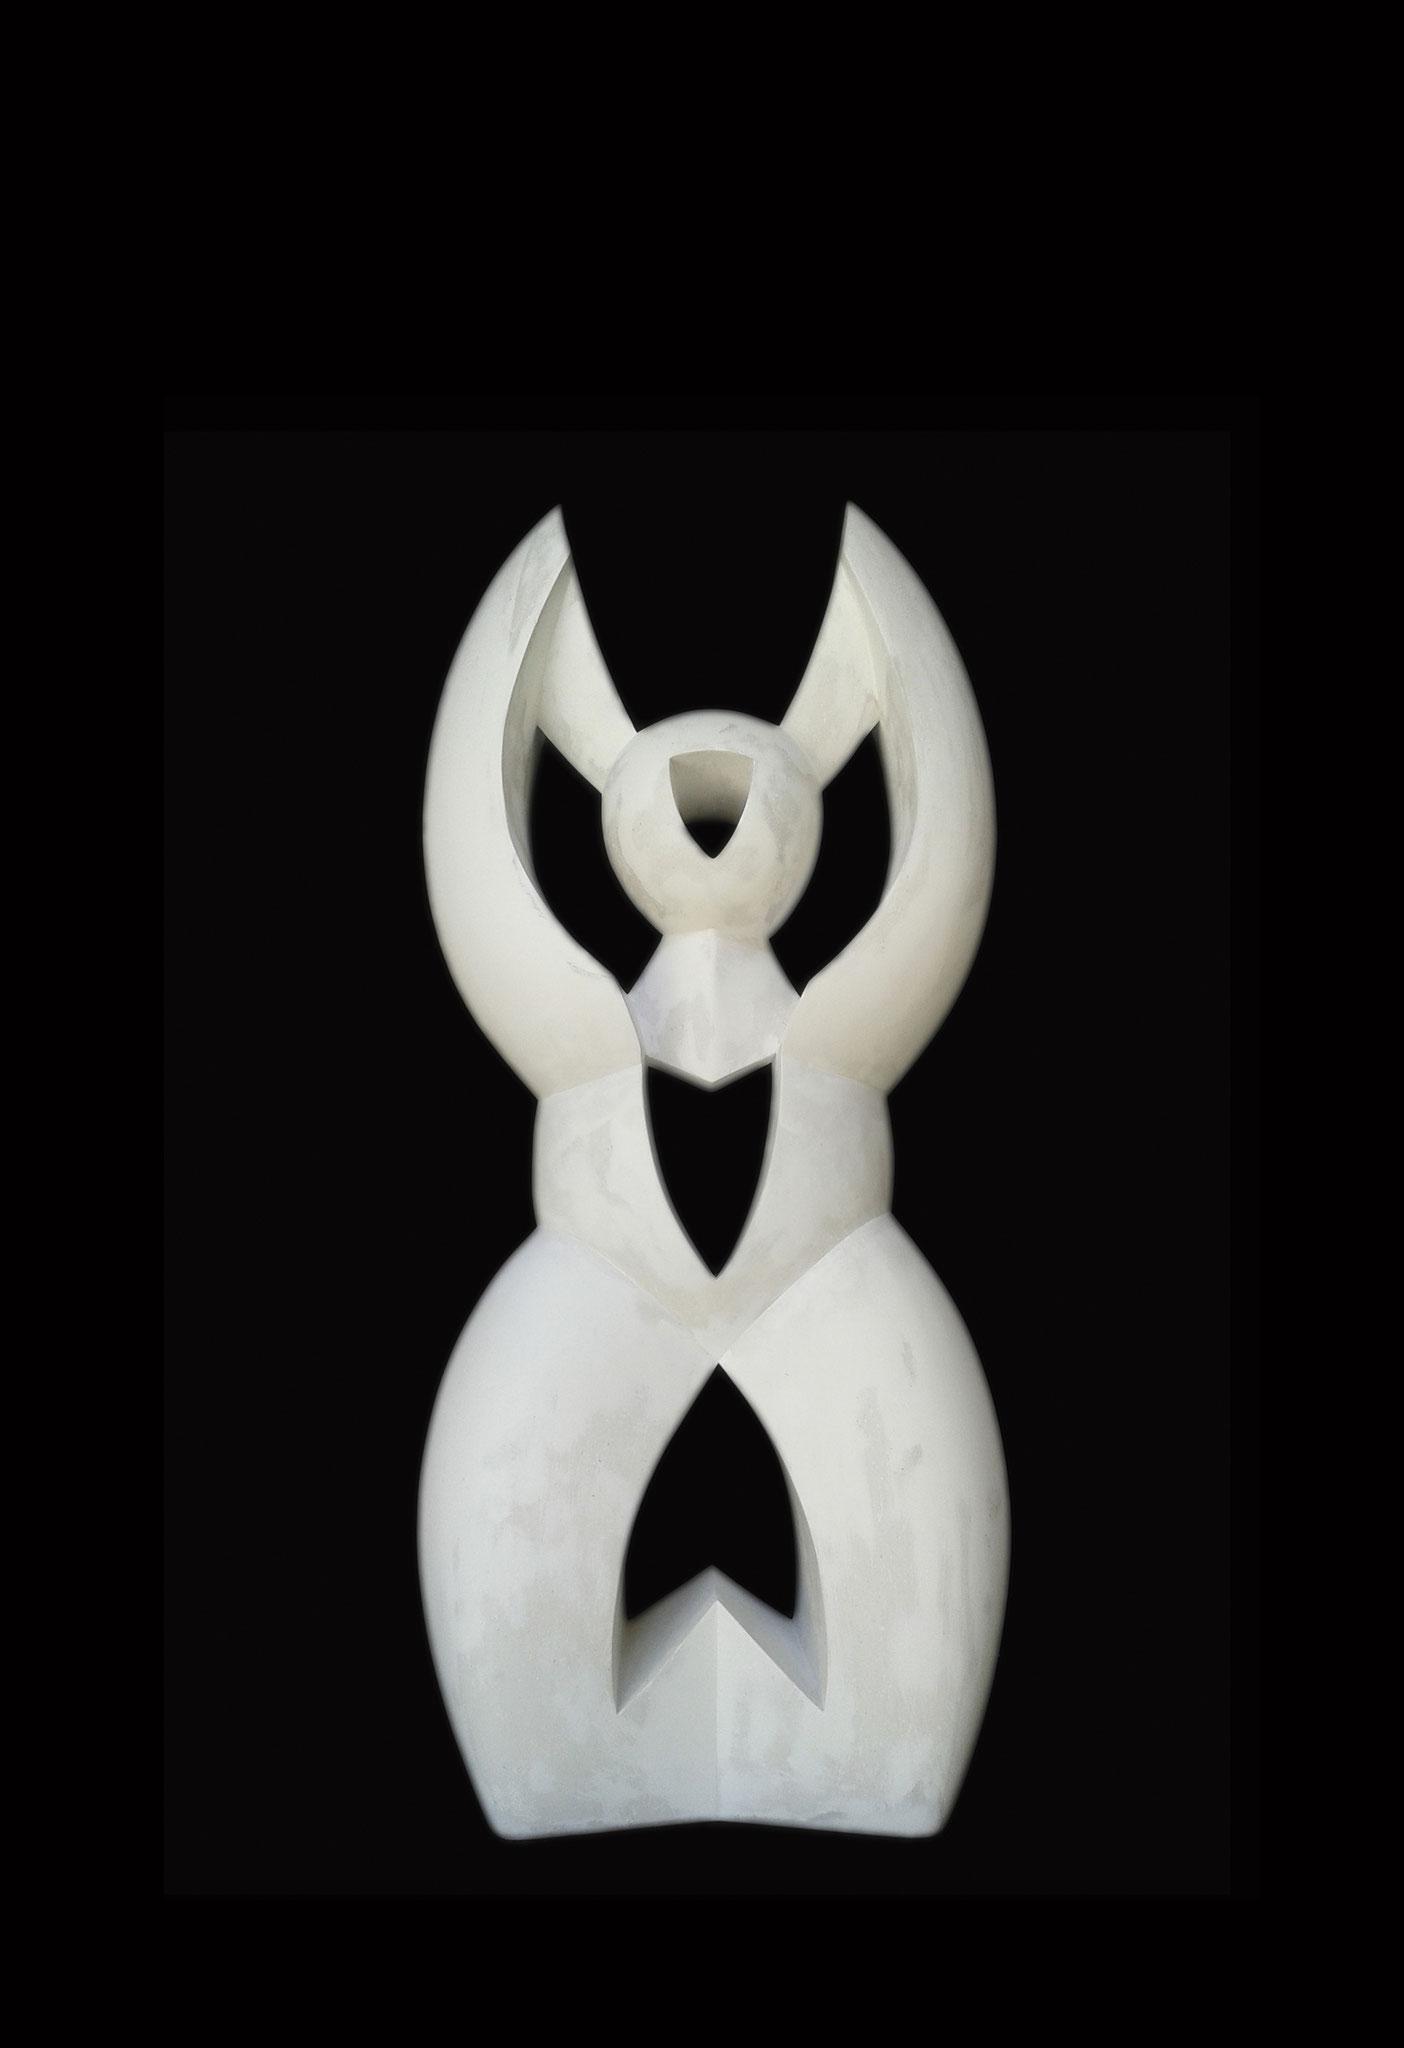 SEMIDIOSA. 2017. 79 x 35 x 23 cm. Plaster